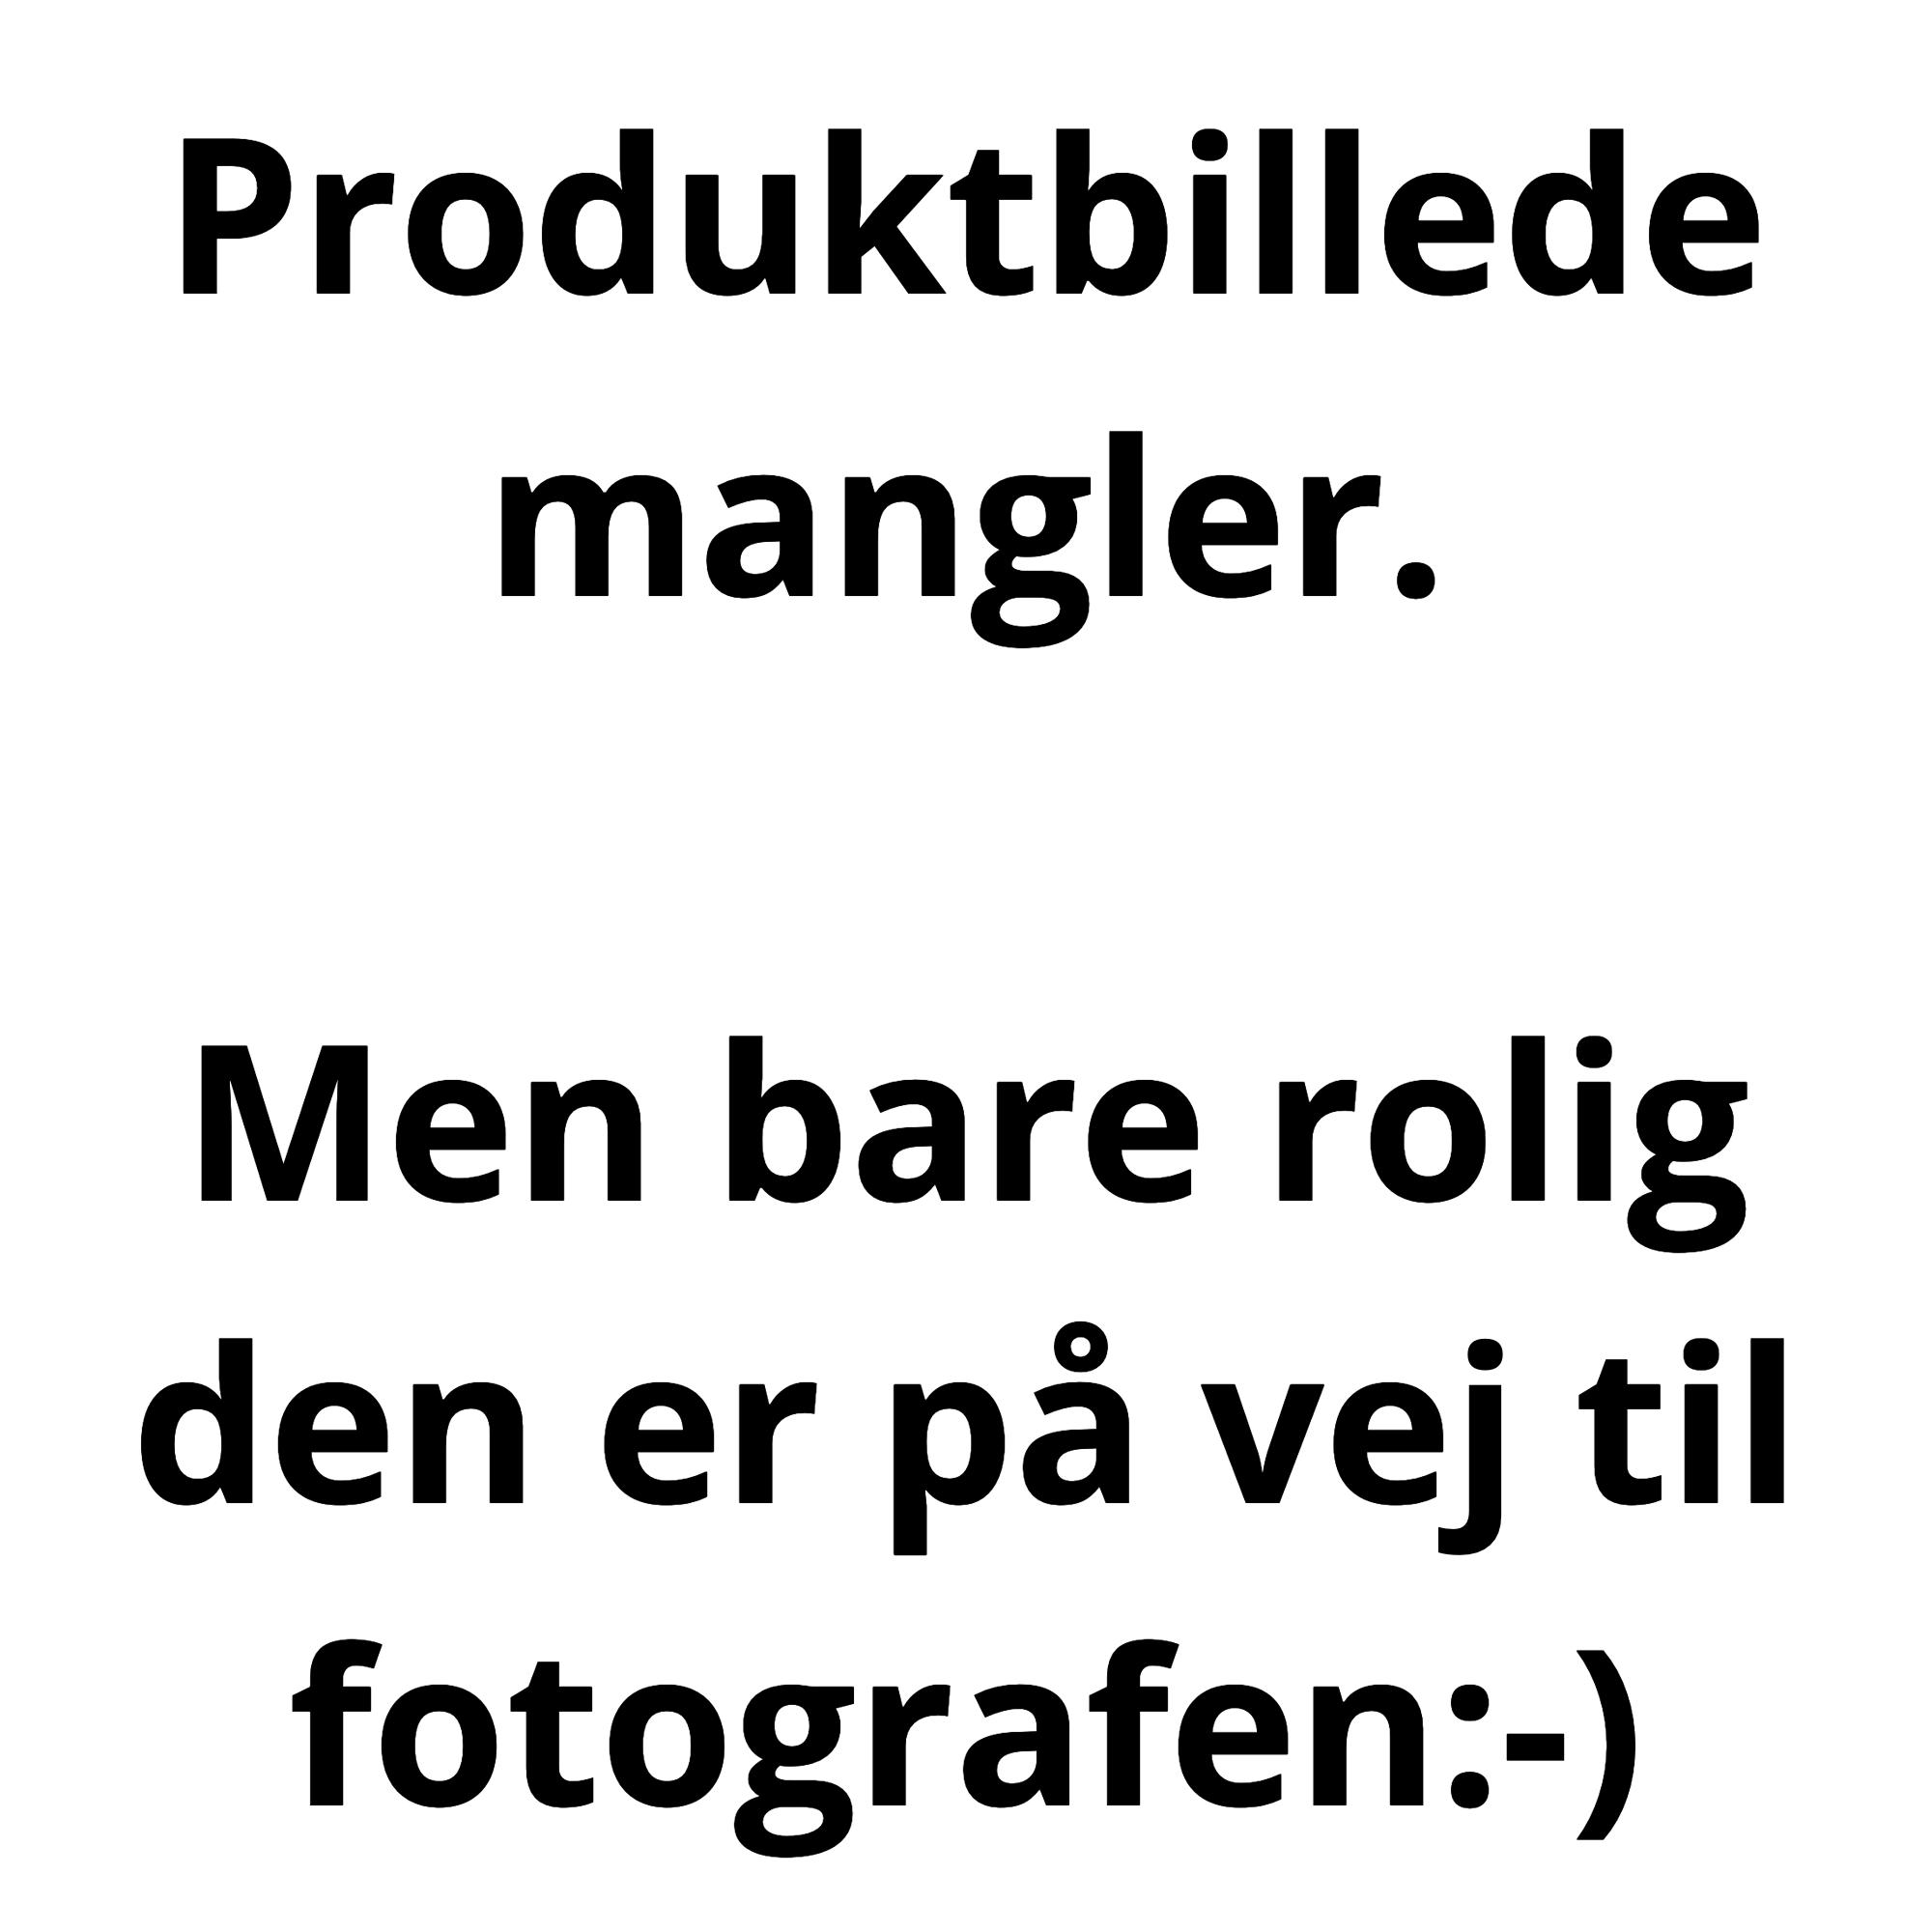 Samsung Galaxy Gear Beskyttelsesfolie - 5 stk